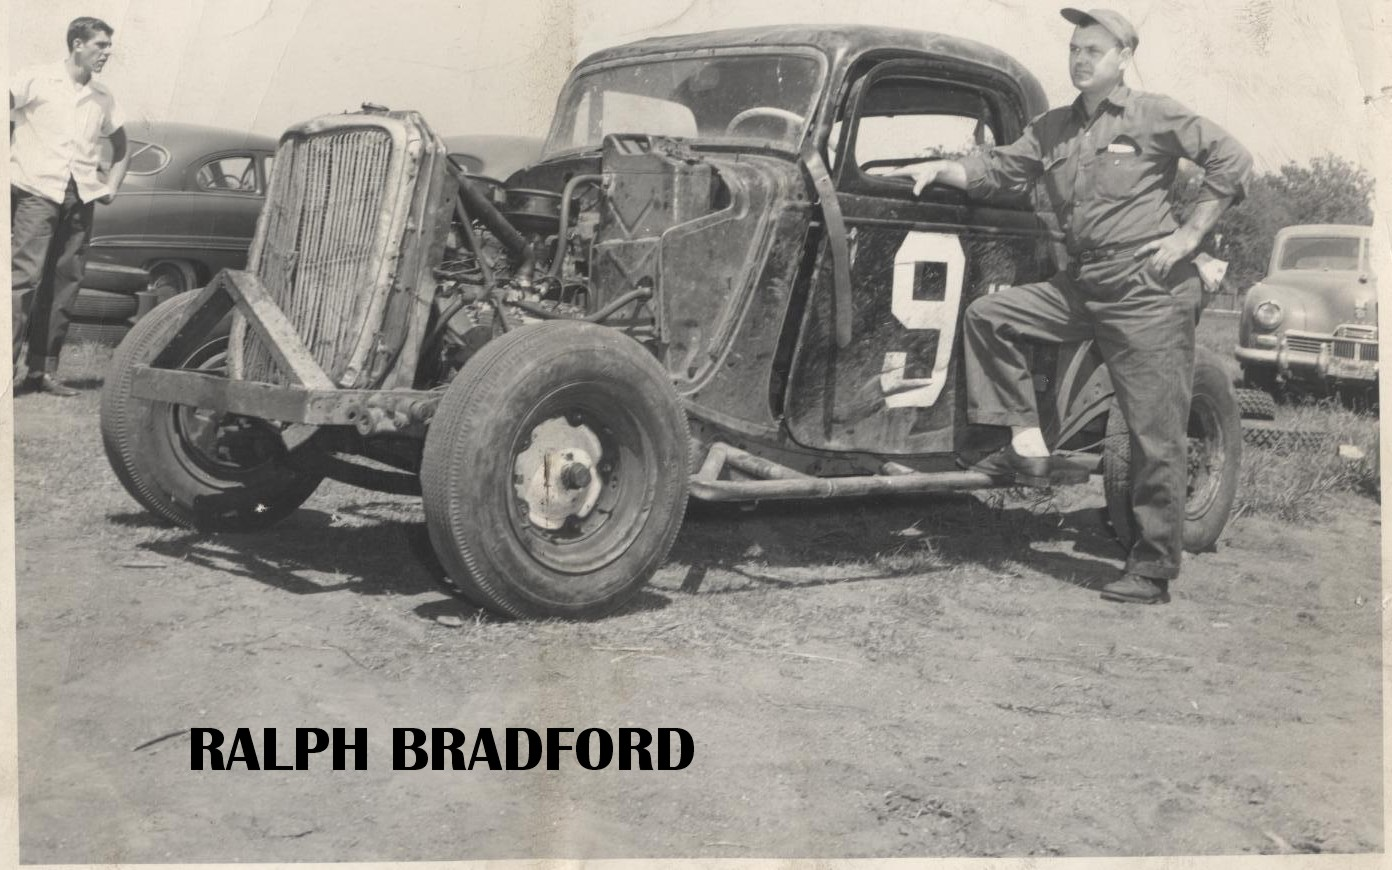 Ralph Bradford